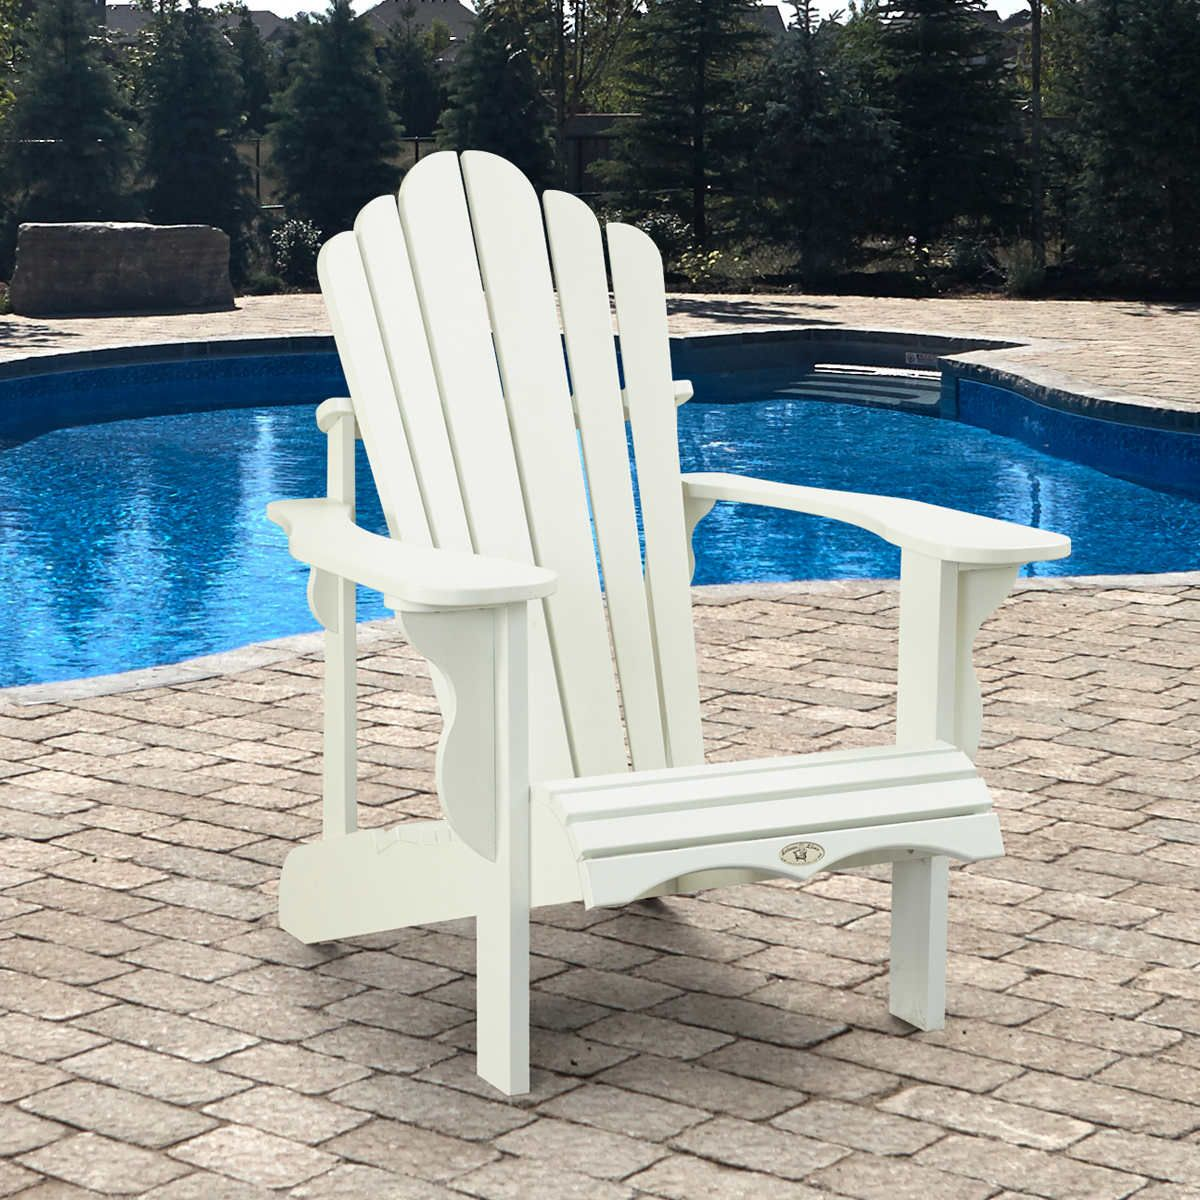 Adirondack chair by leisure line adirondack chair white